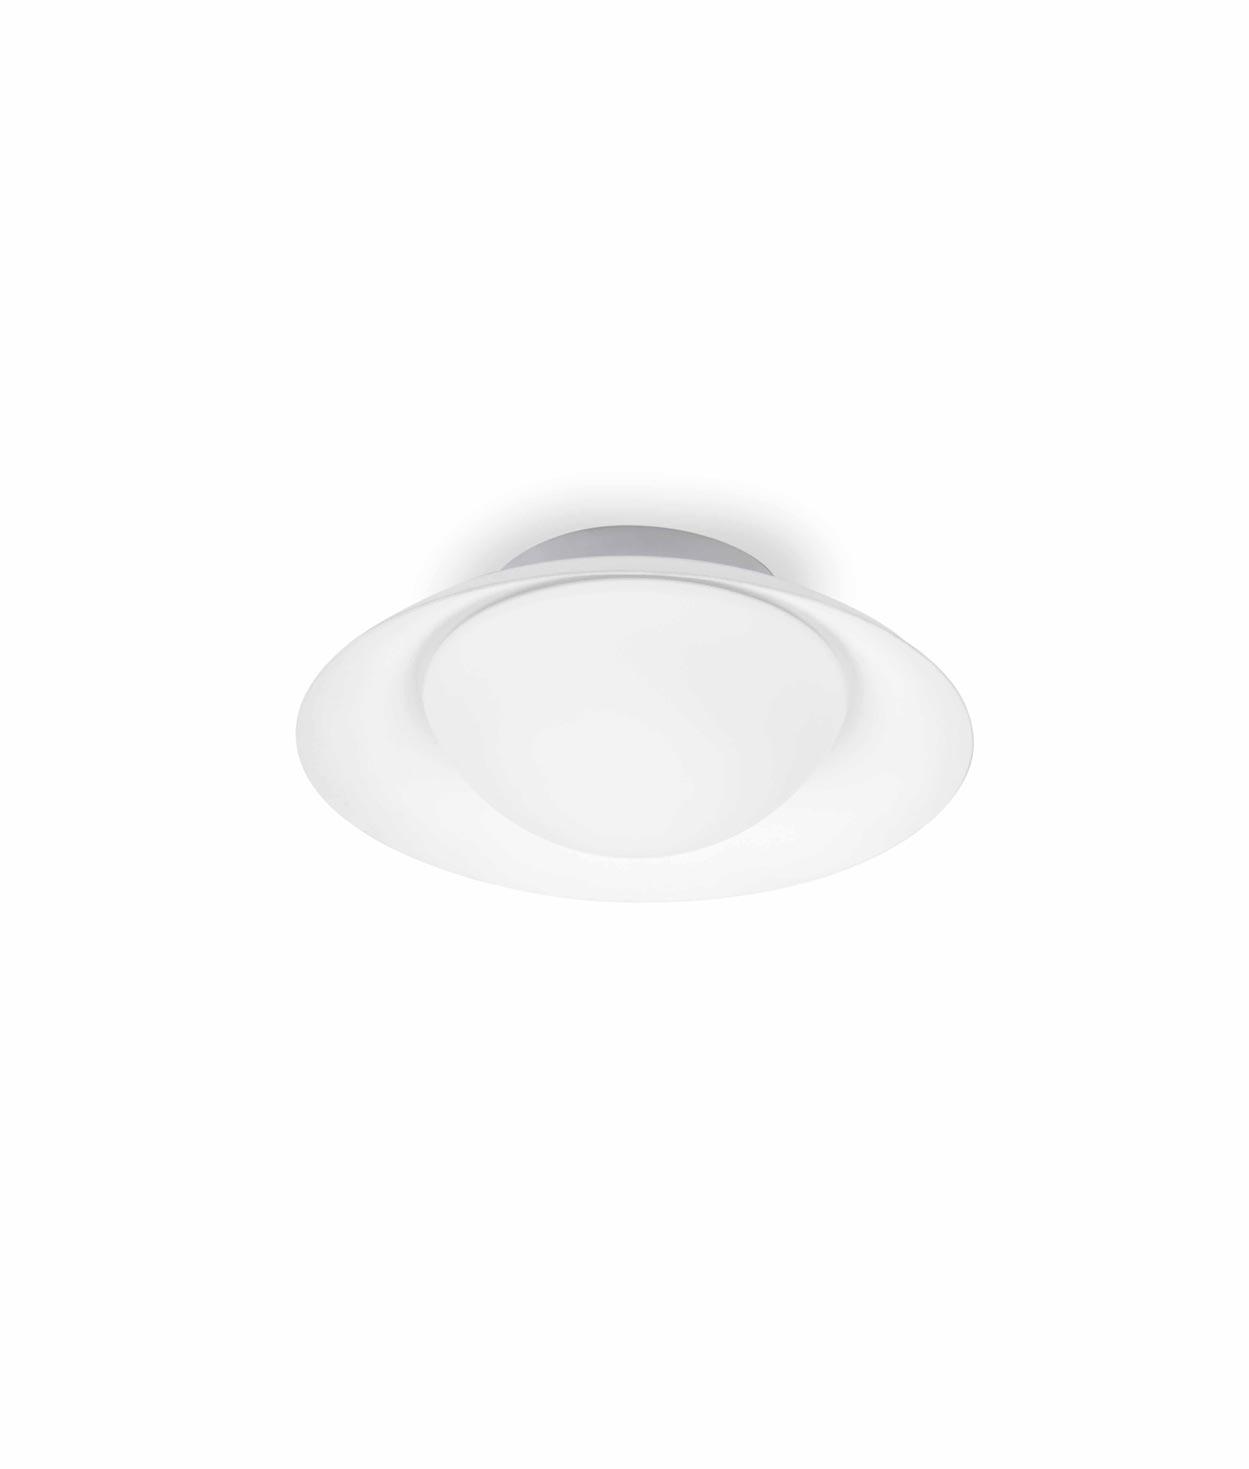 Plafón pequeño blanco SIDE LED